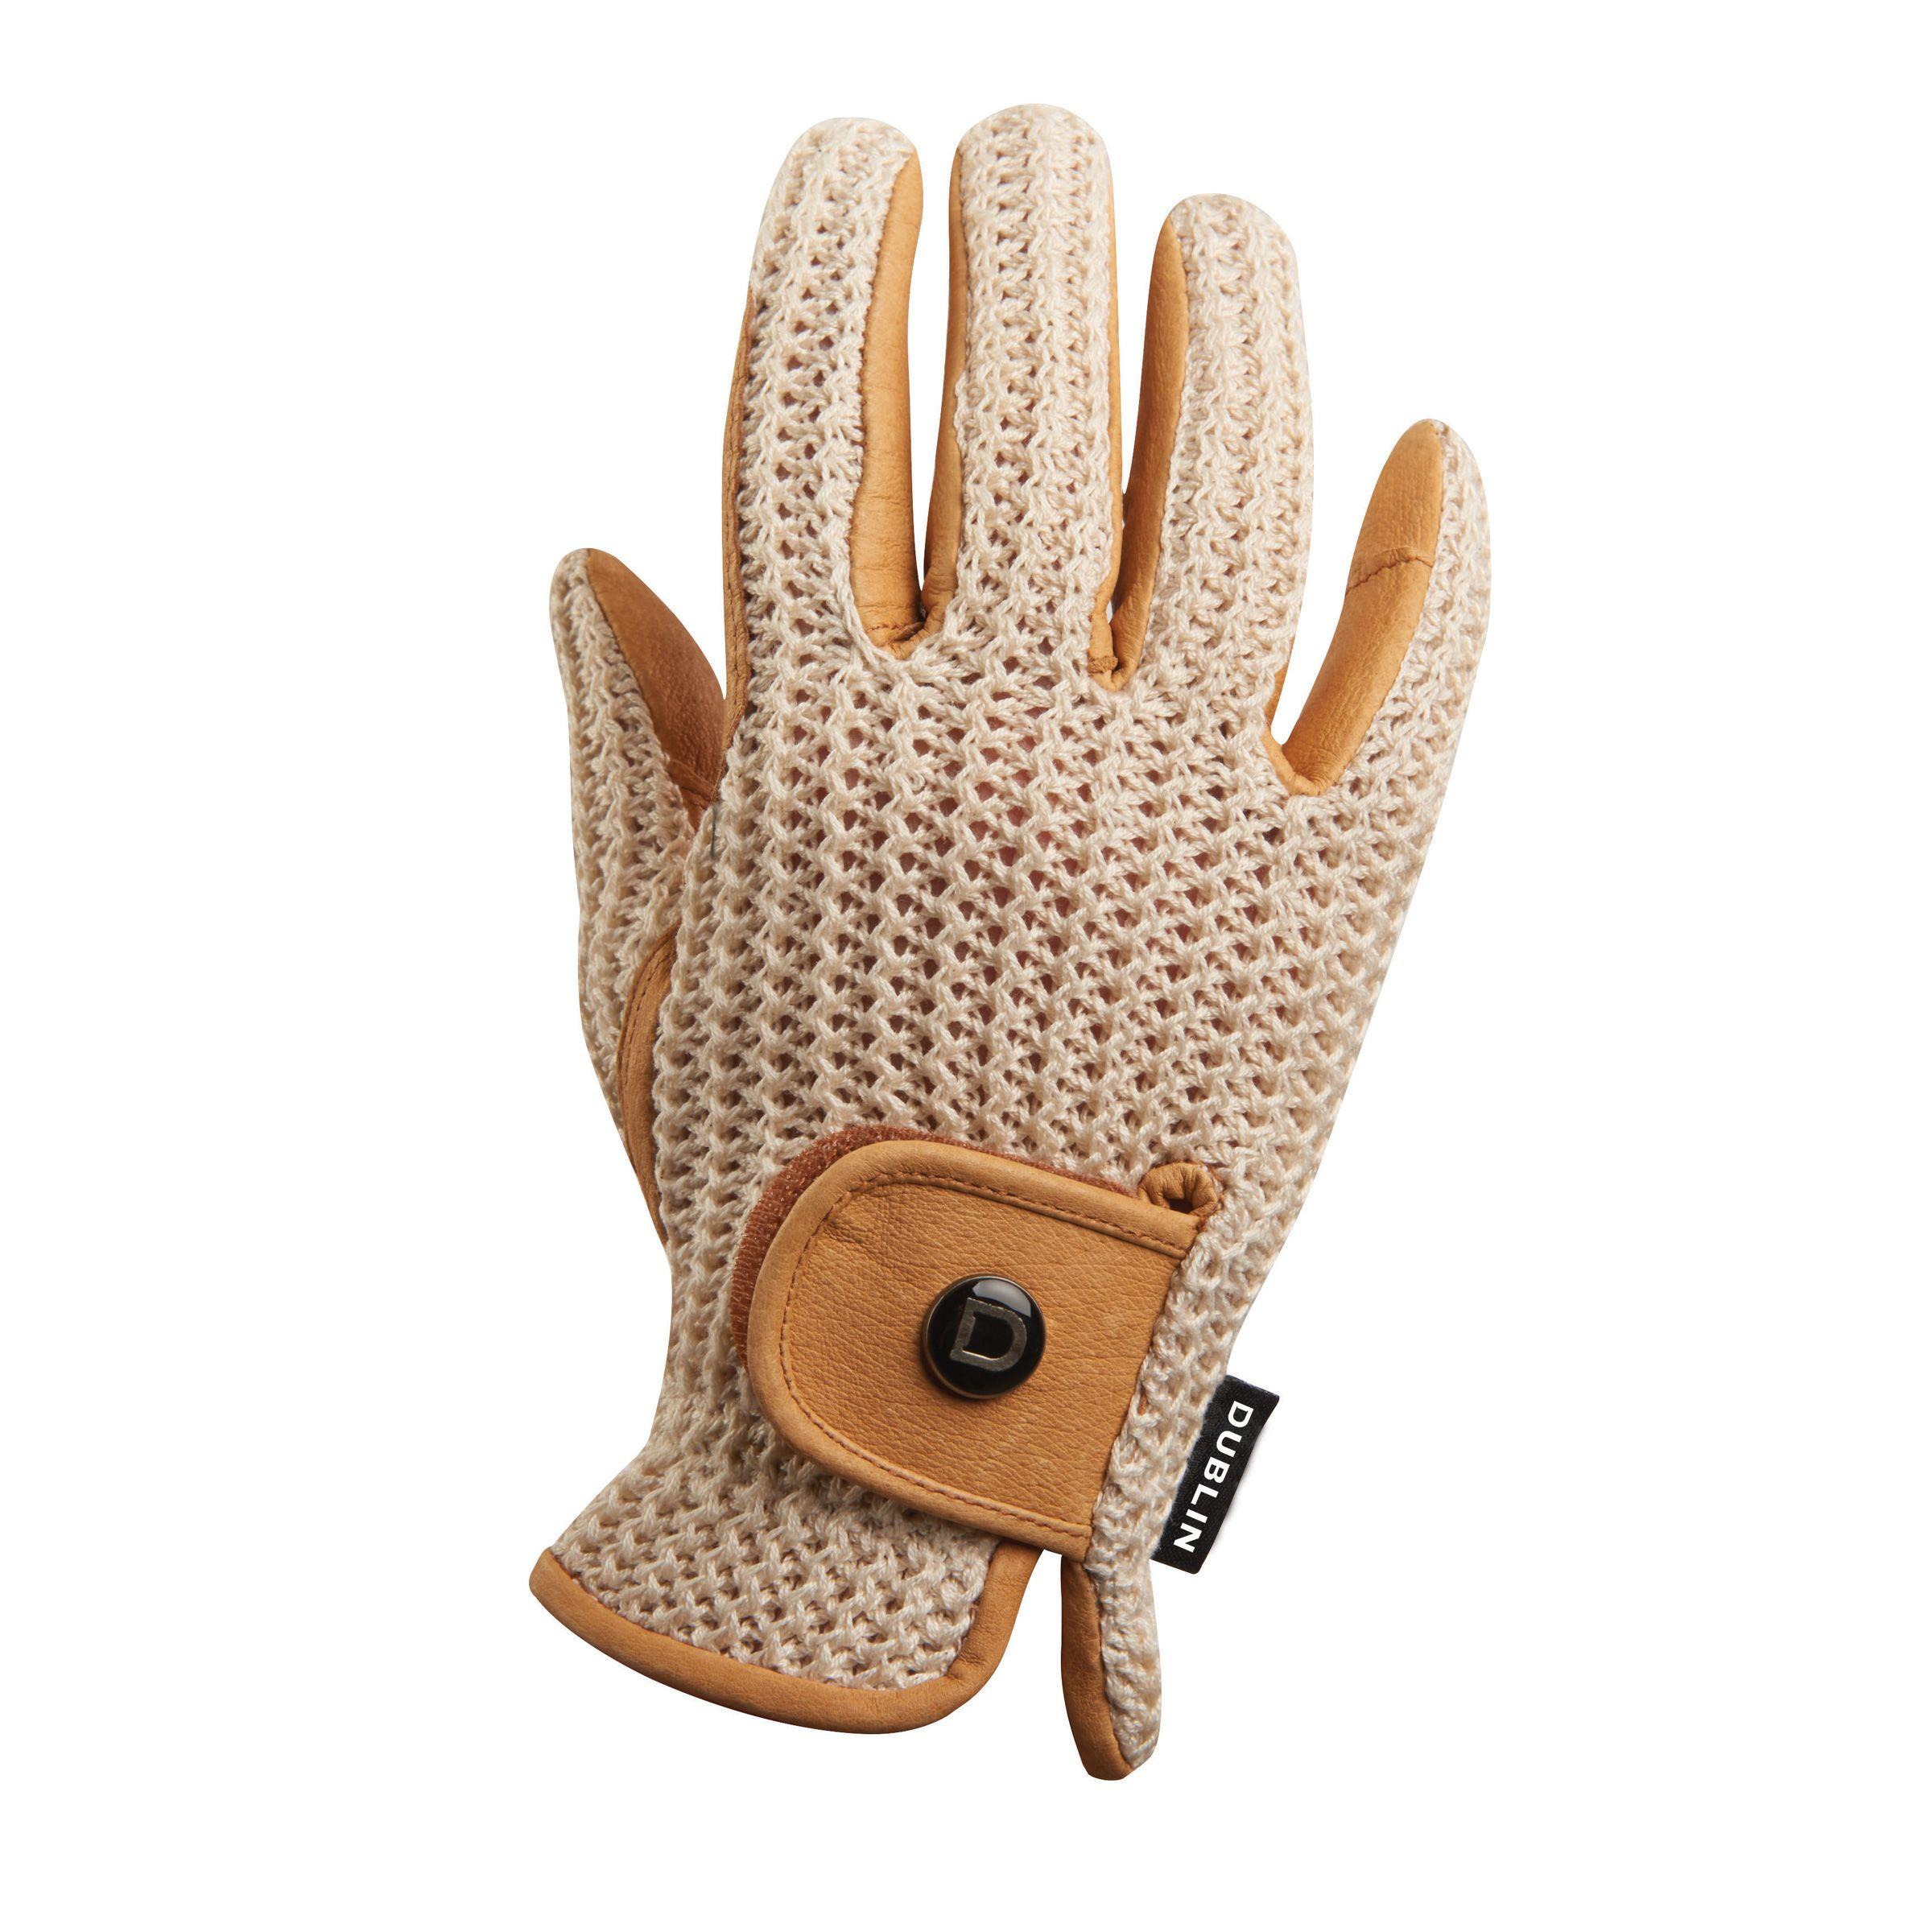 Dublin Crochet Riding Gloves